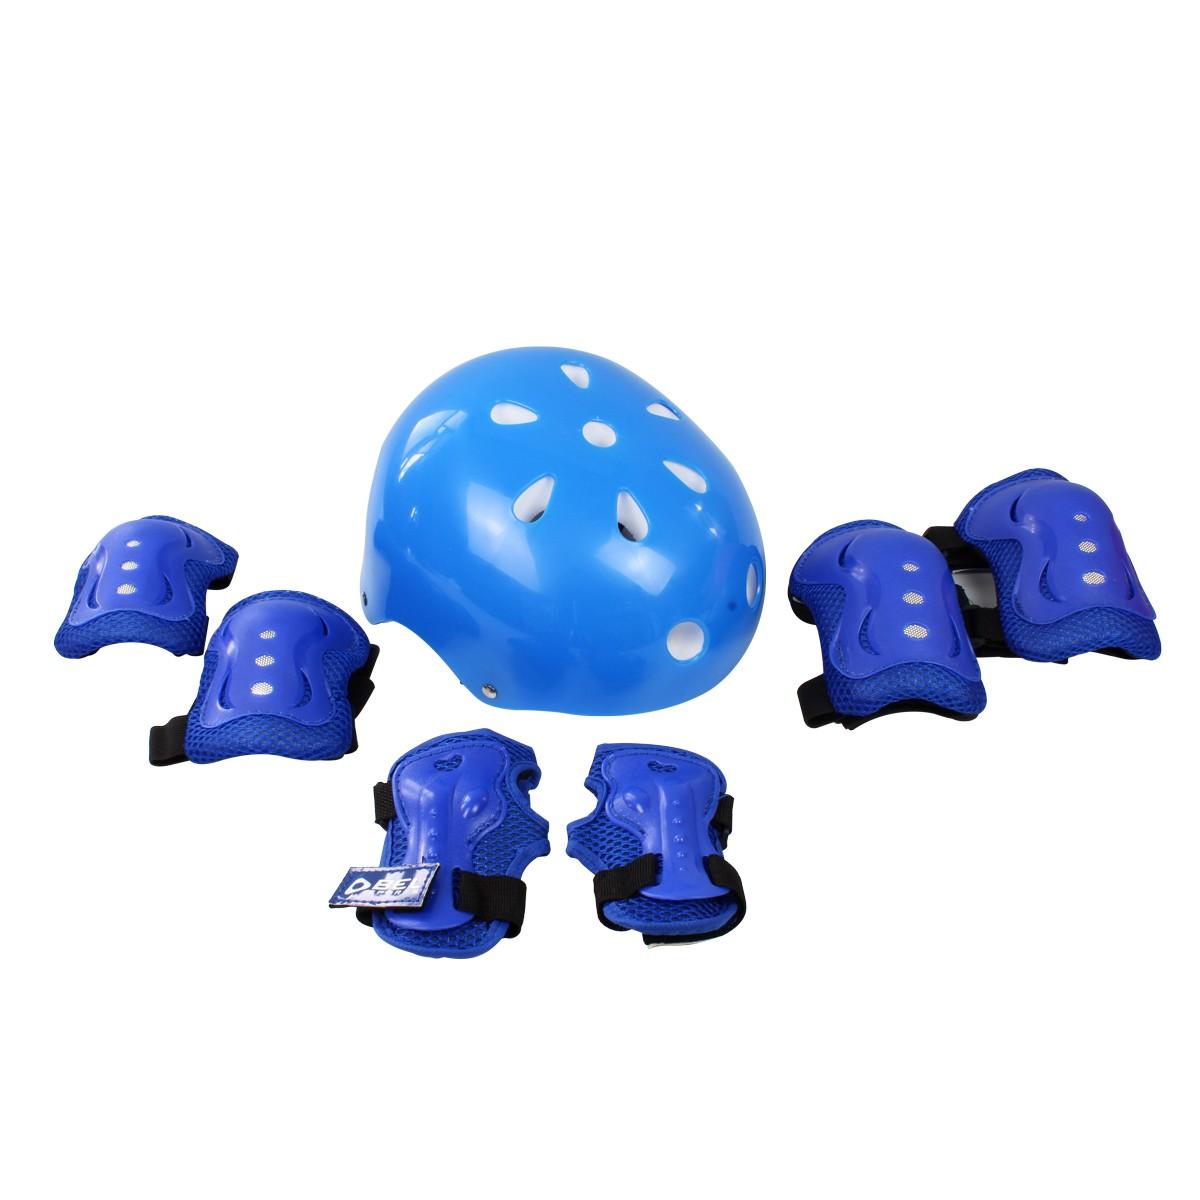 Kit Proteção Radical Azul C/ Capacete Tamanho M Belfix